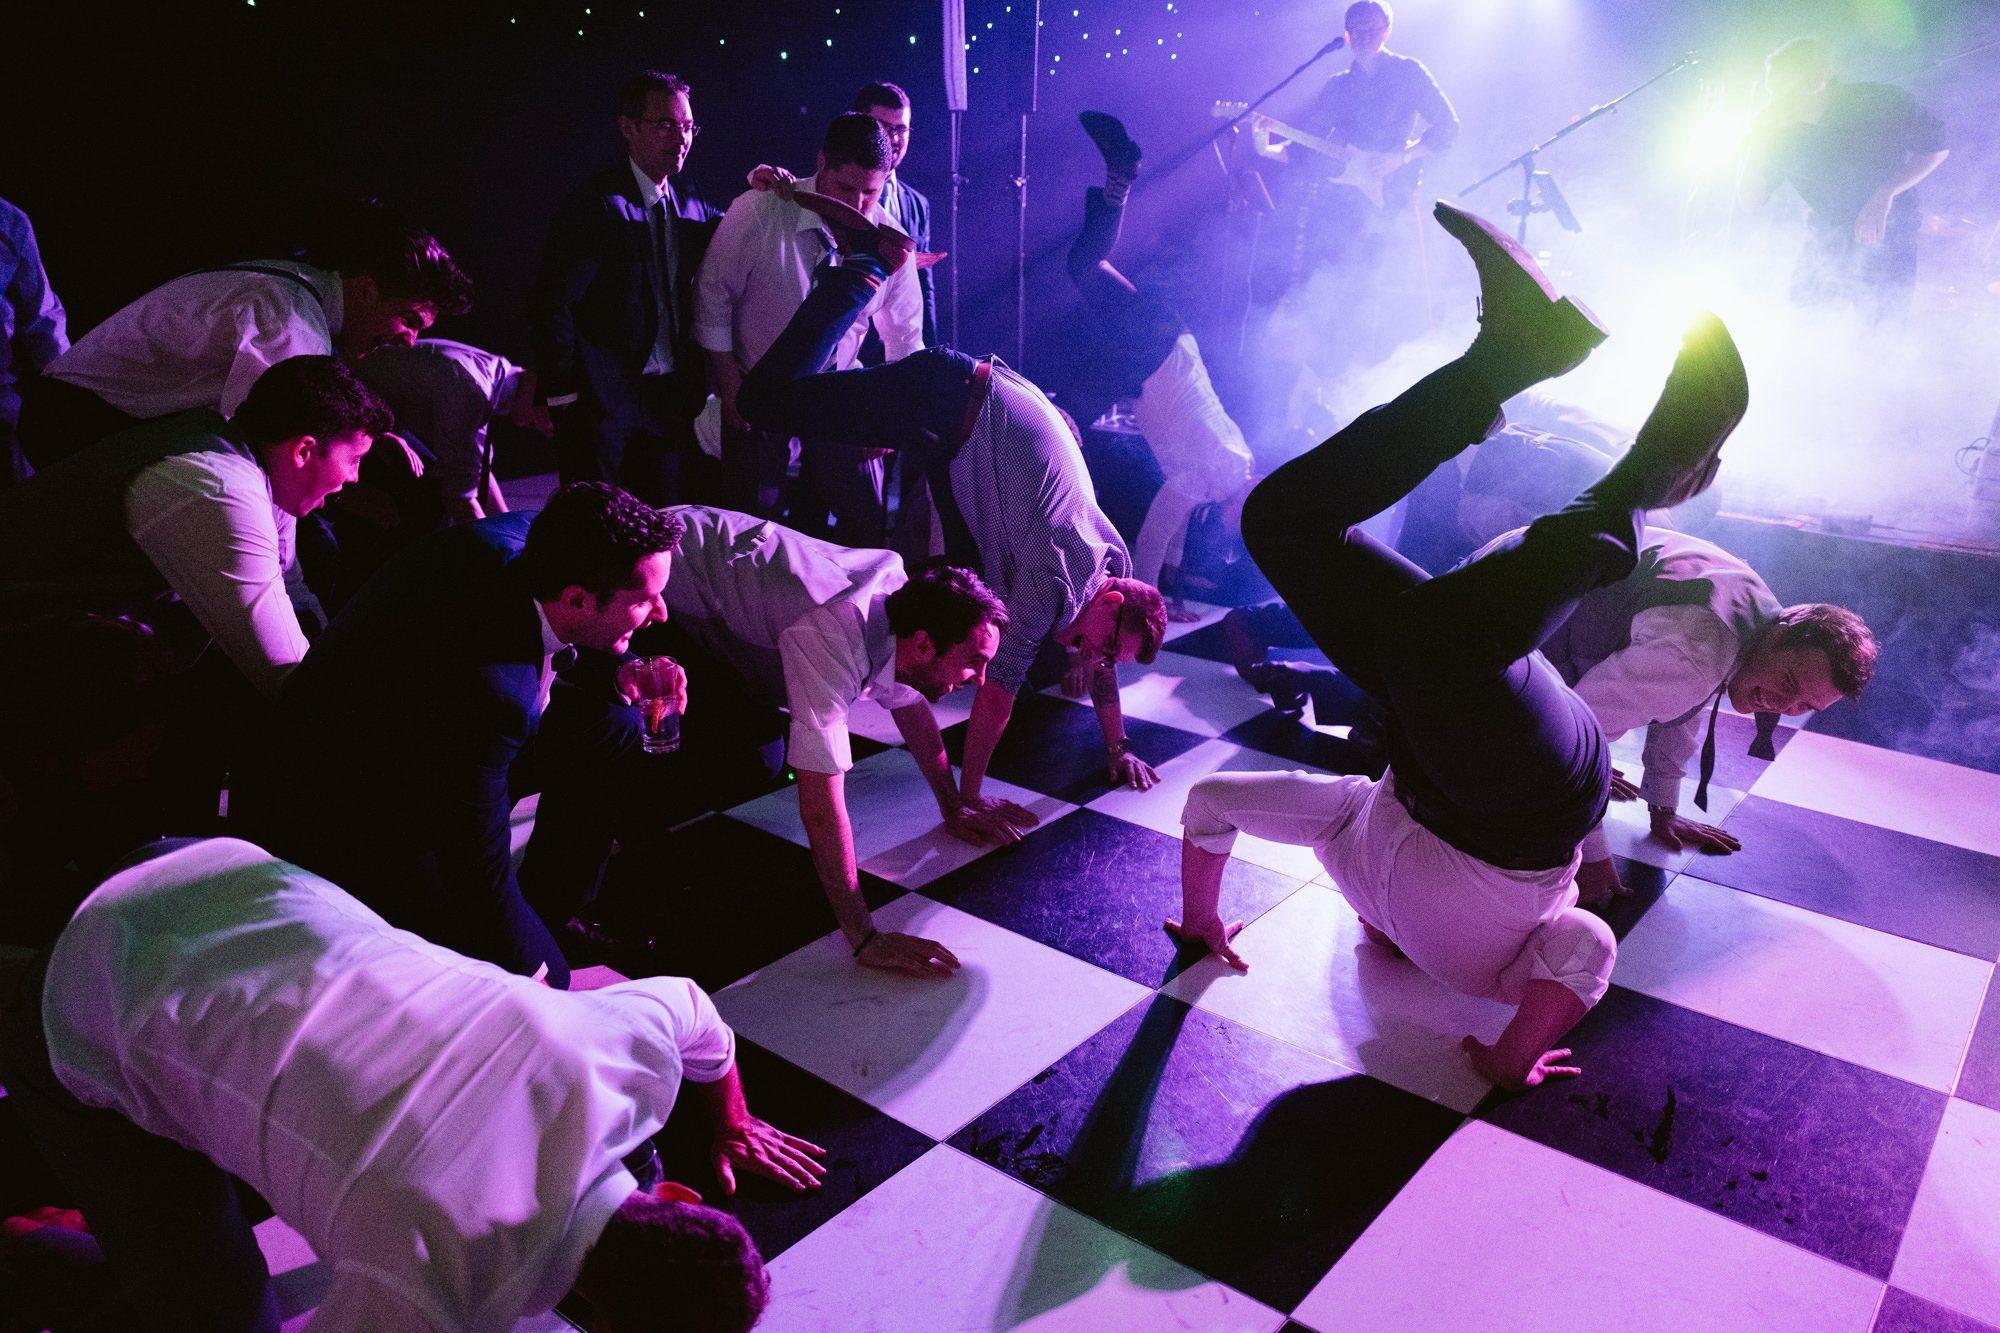 newby hall dancefloor